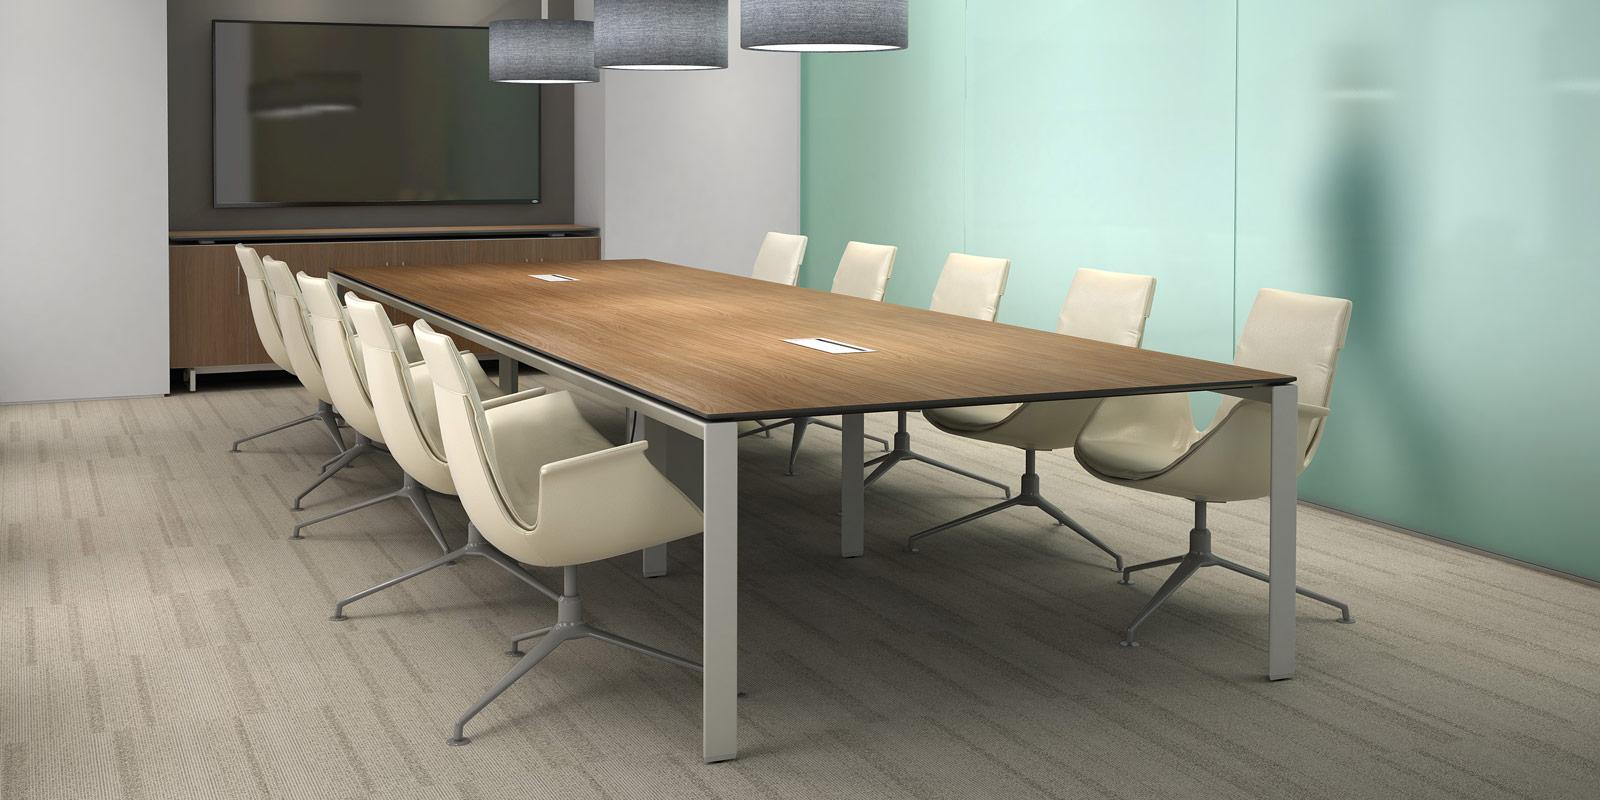 VQV Furniture Group